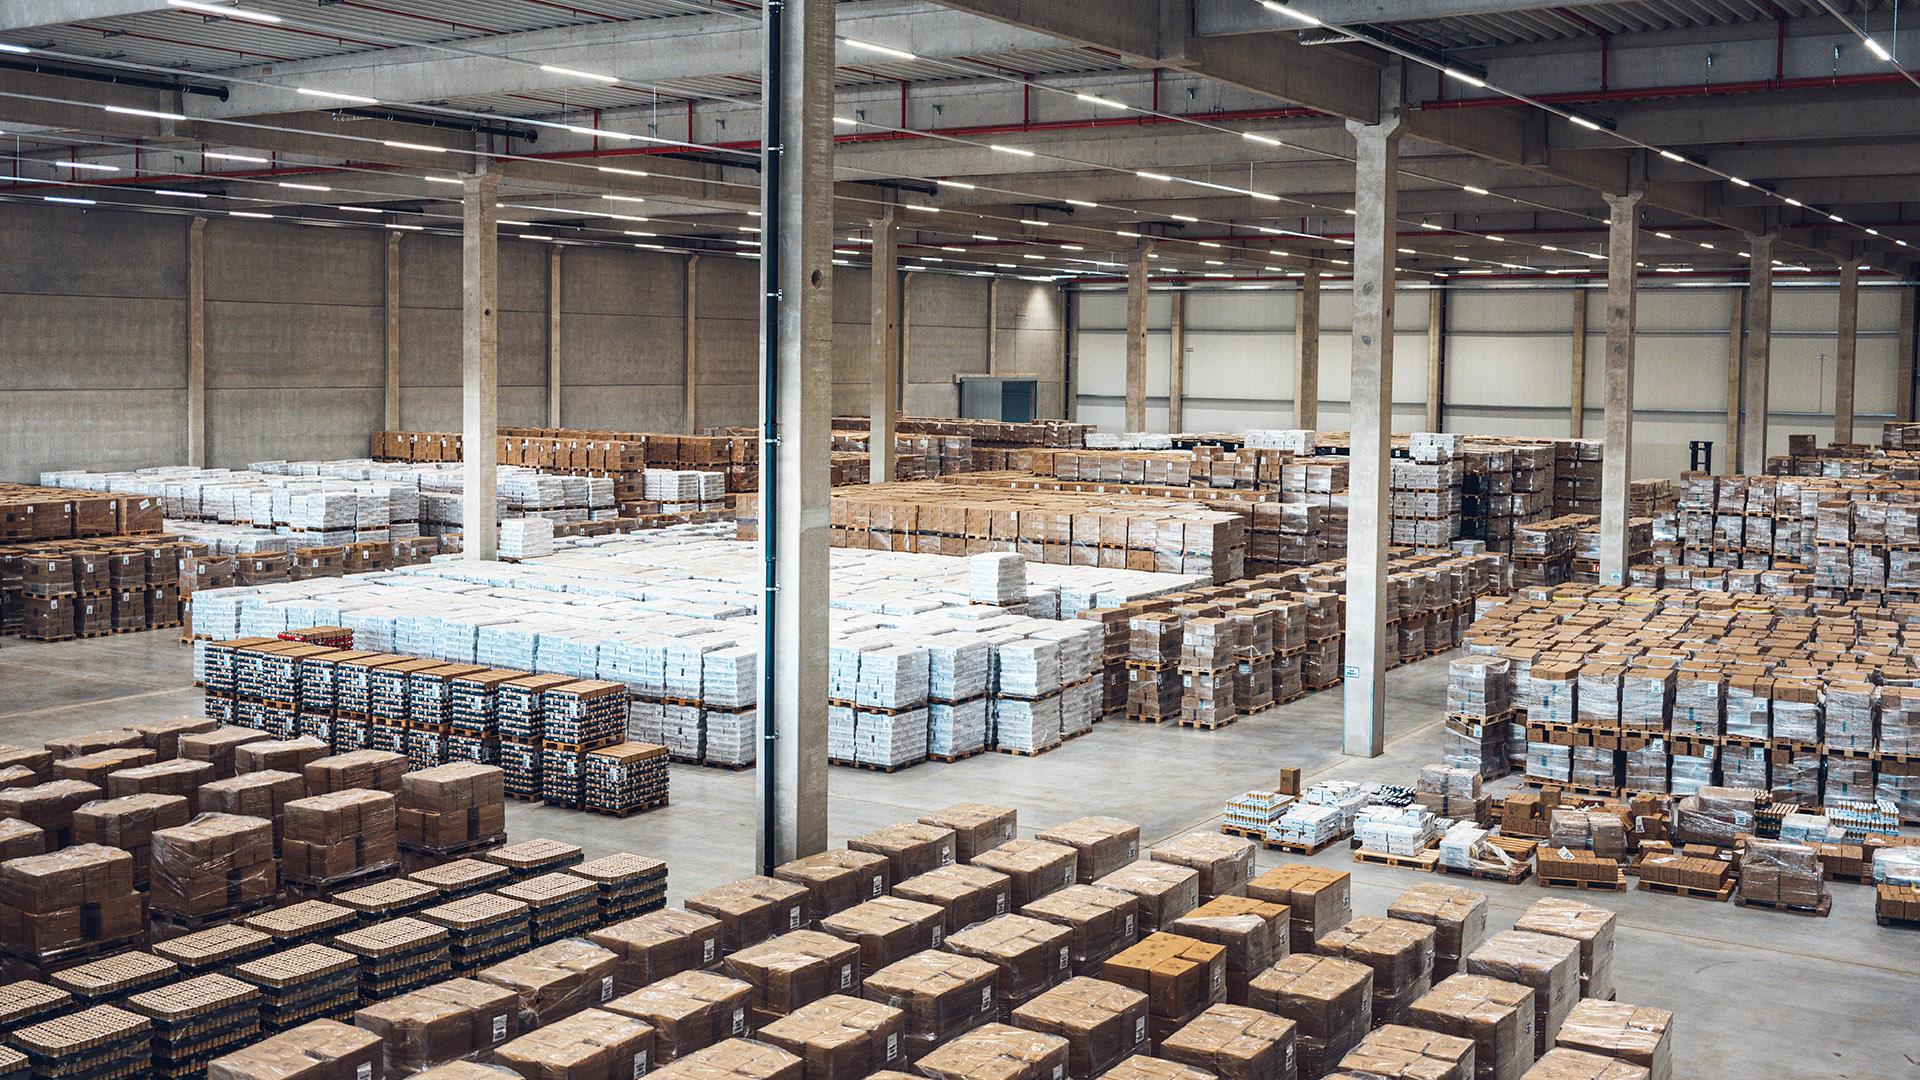 Lagerung Stenkamp Transporte GmbH Lagerung Logistik Borken Duisburg Lebensmittel Lager Transport